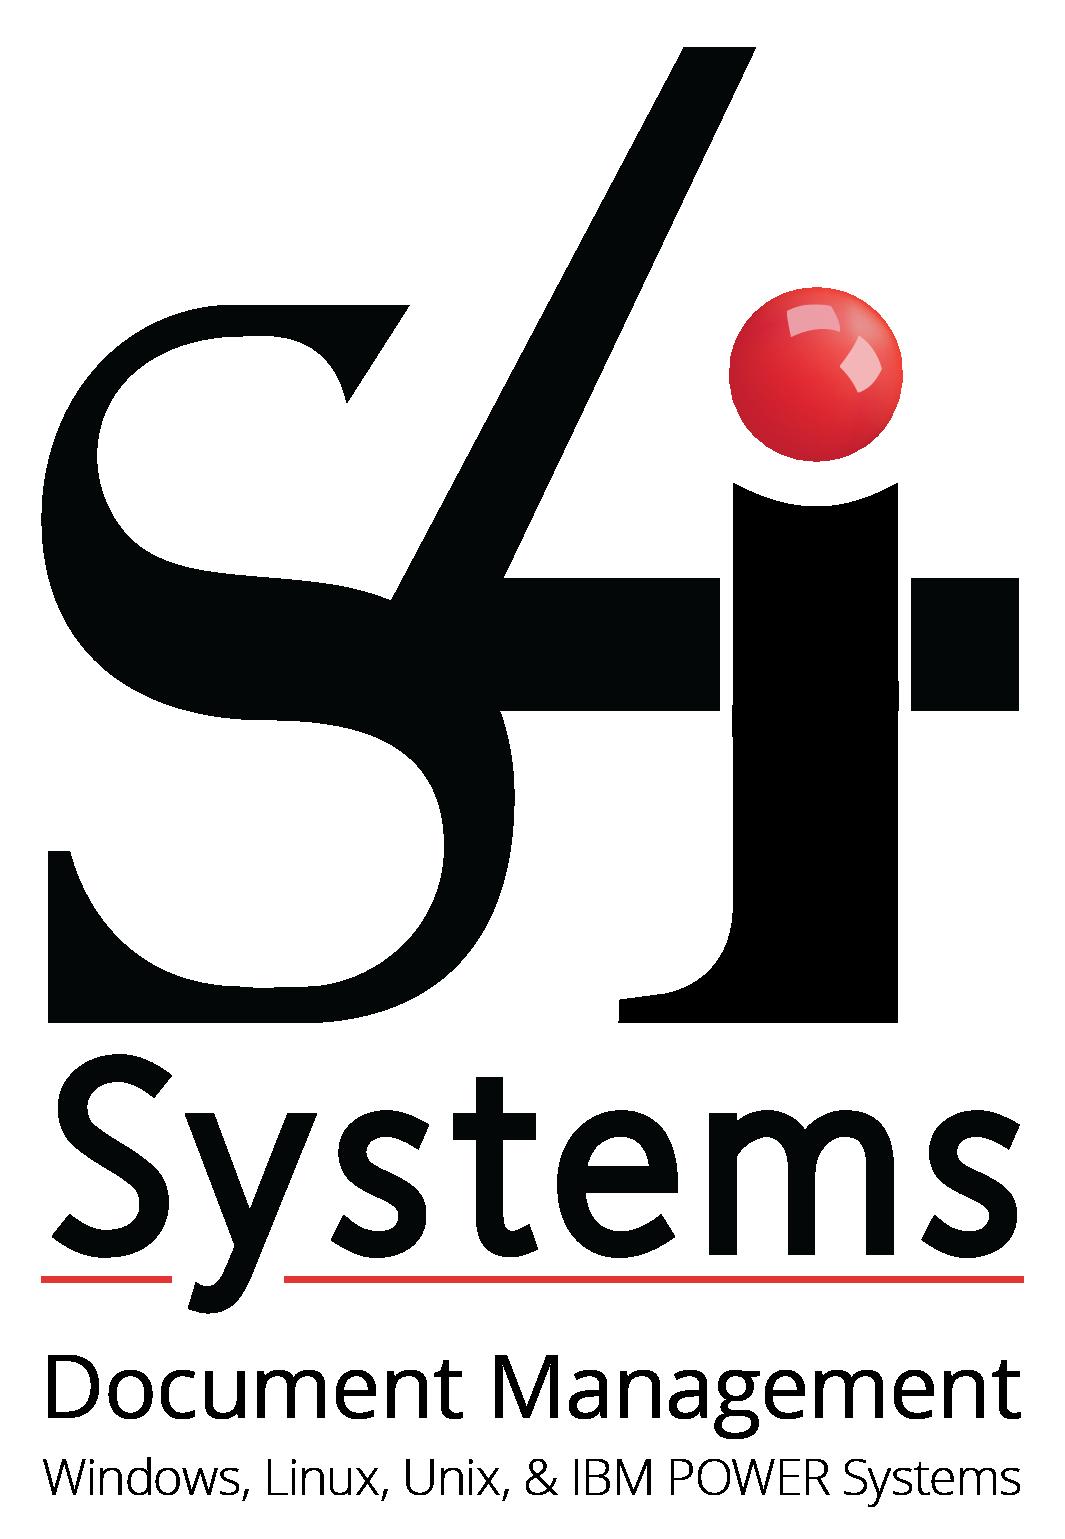 S4i_Logos_Vertical_01.30.17_Windows First